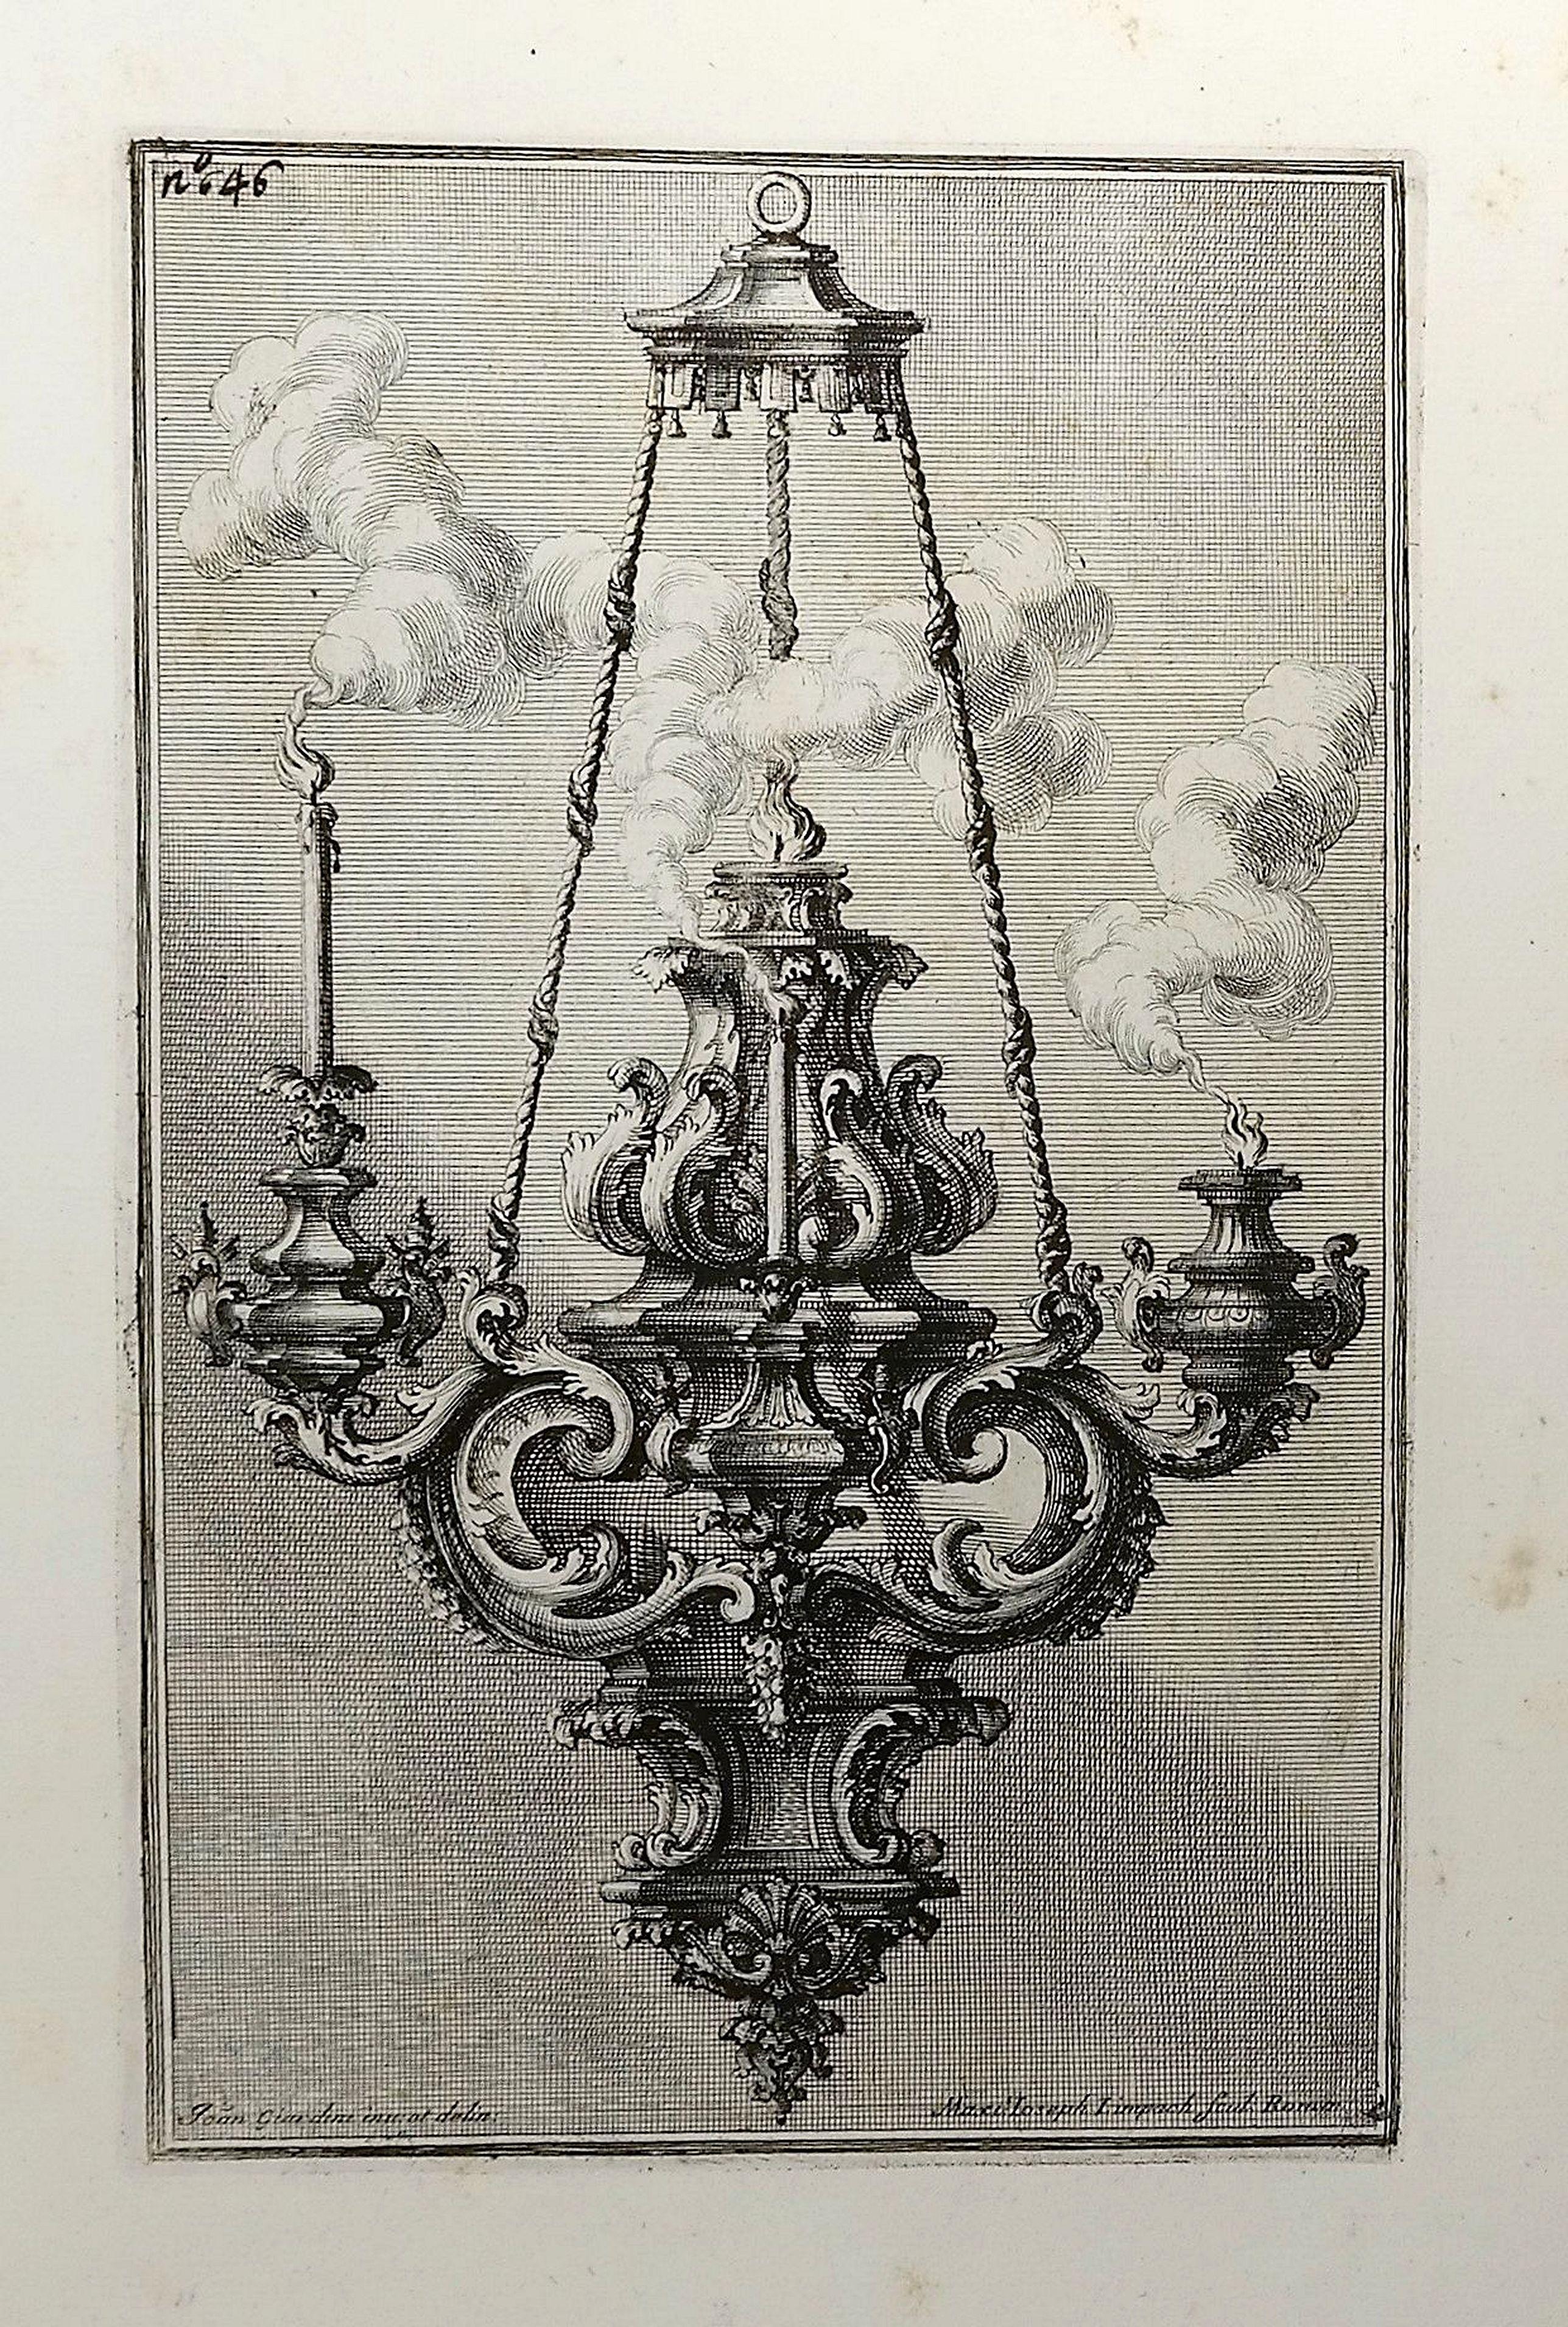 GIARDINI, G. - [Design Art] Italian Chandelier No. 46